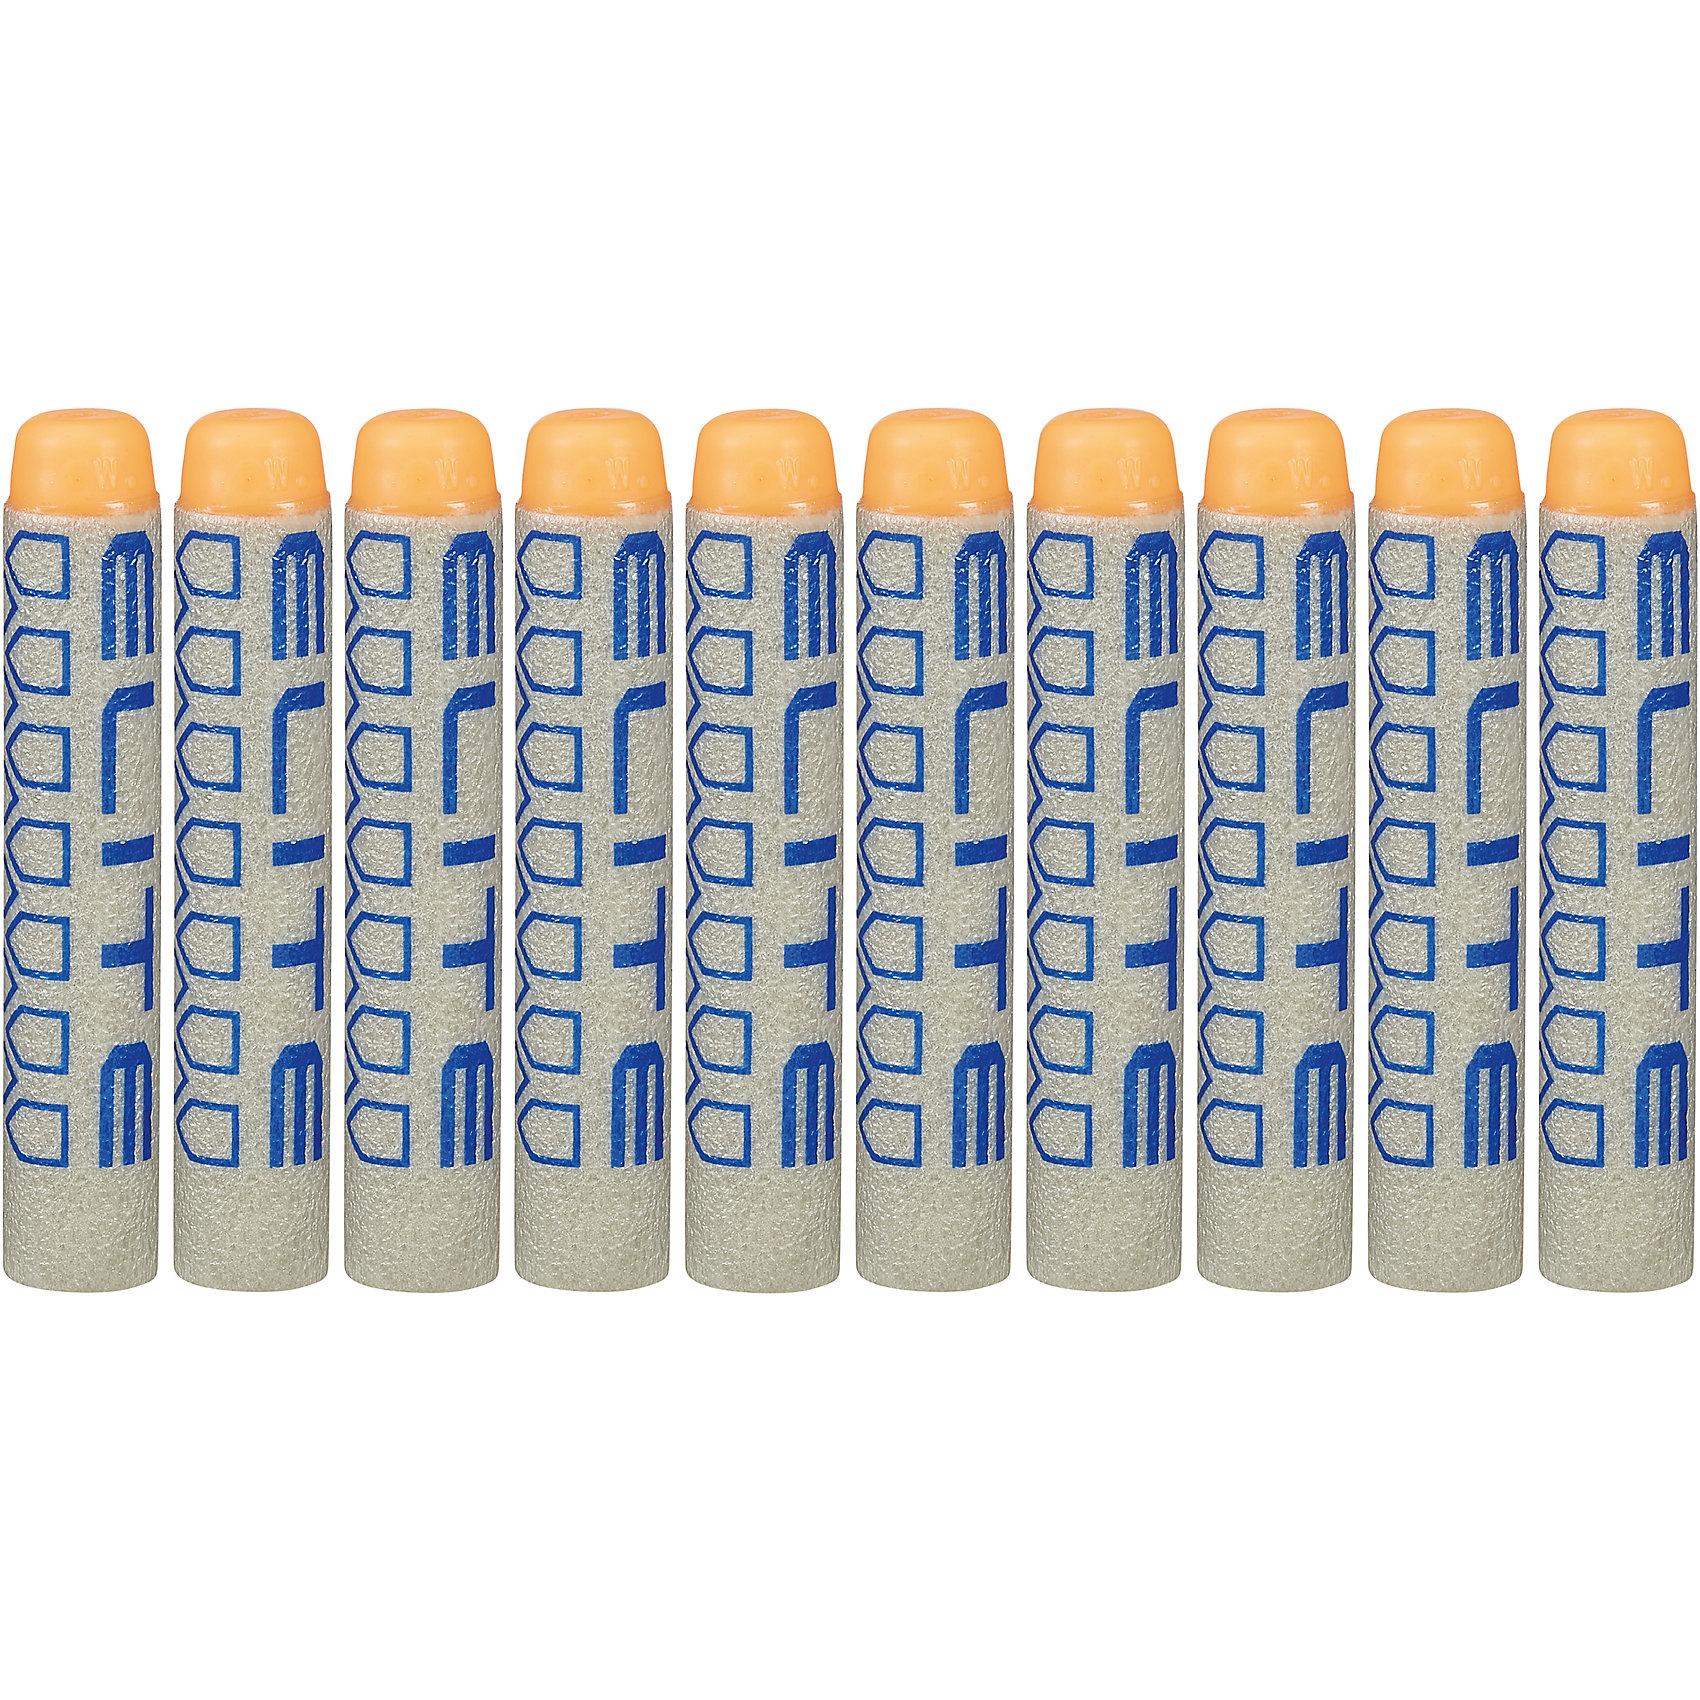 Hasbro 10 деко-стрел для бластер Элит, Nerf sport elit 10 12ft